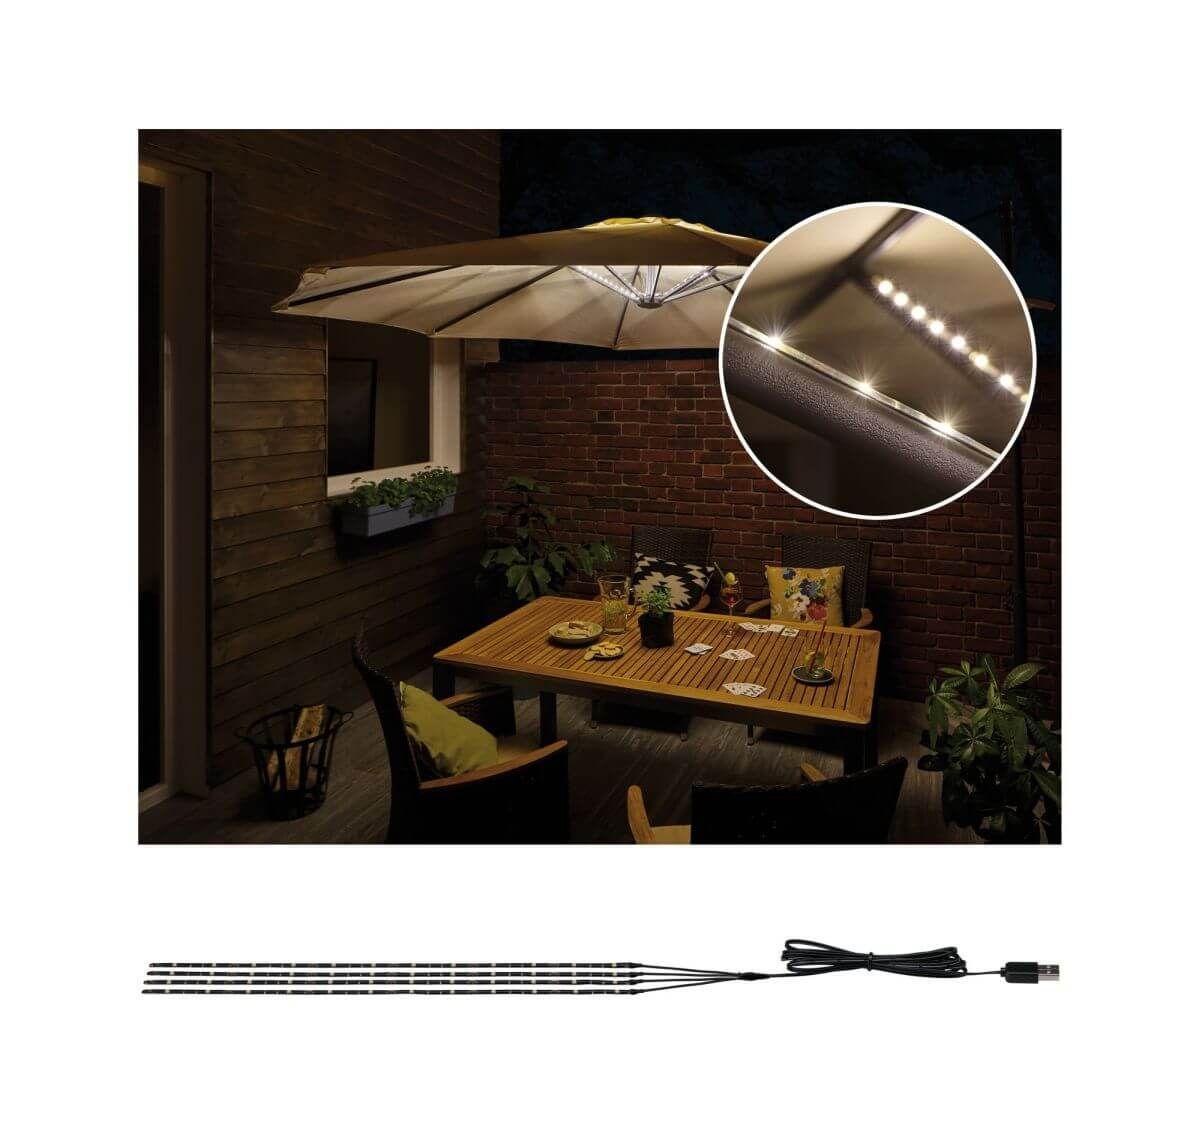 Paulmann Mobile Strip Parasol Schirm Beleuchtung Ip44 4er Set 4x40cm Sonnenschirm Led Stripes Led Stripes Runde Badezimmerspiegel Beleuchtung